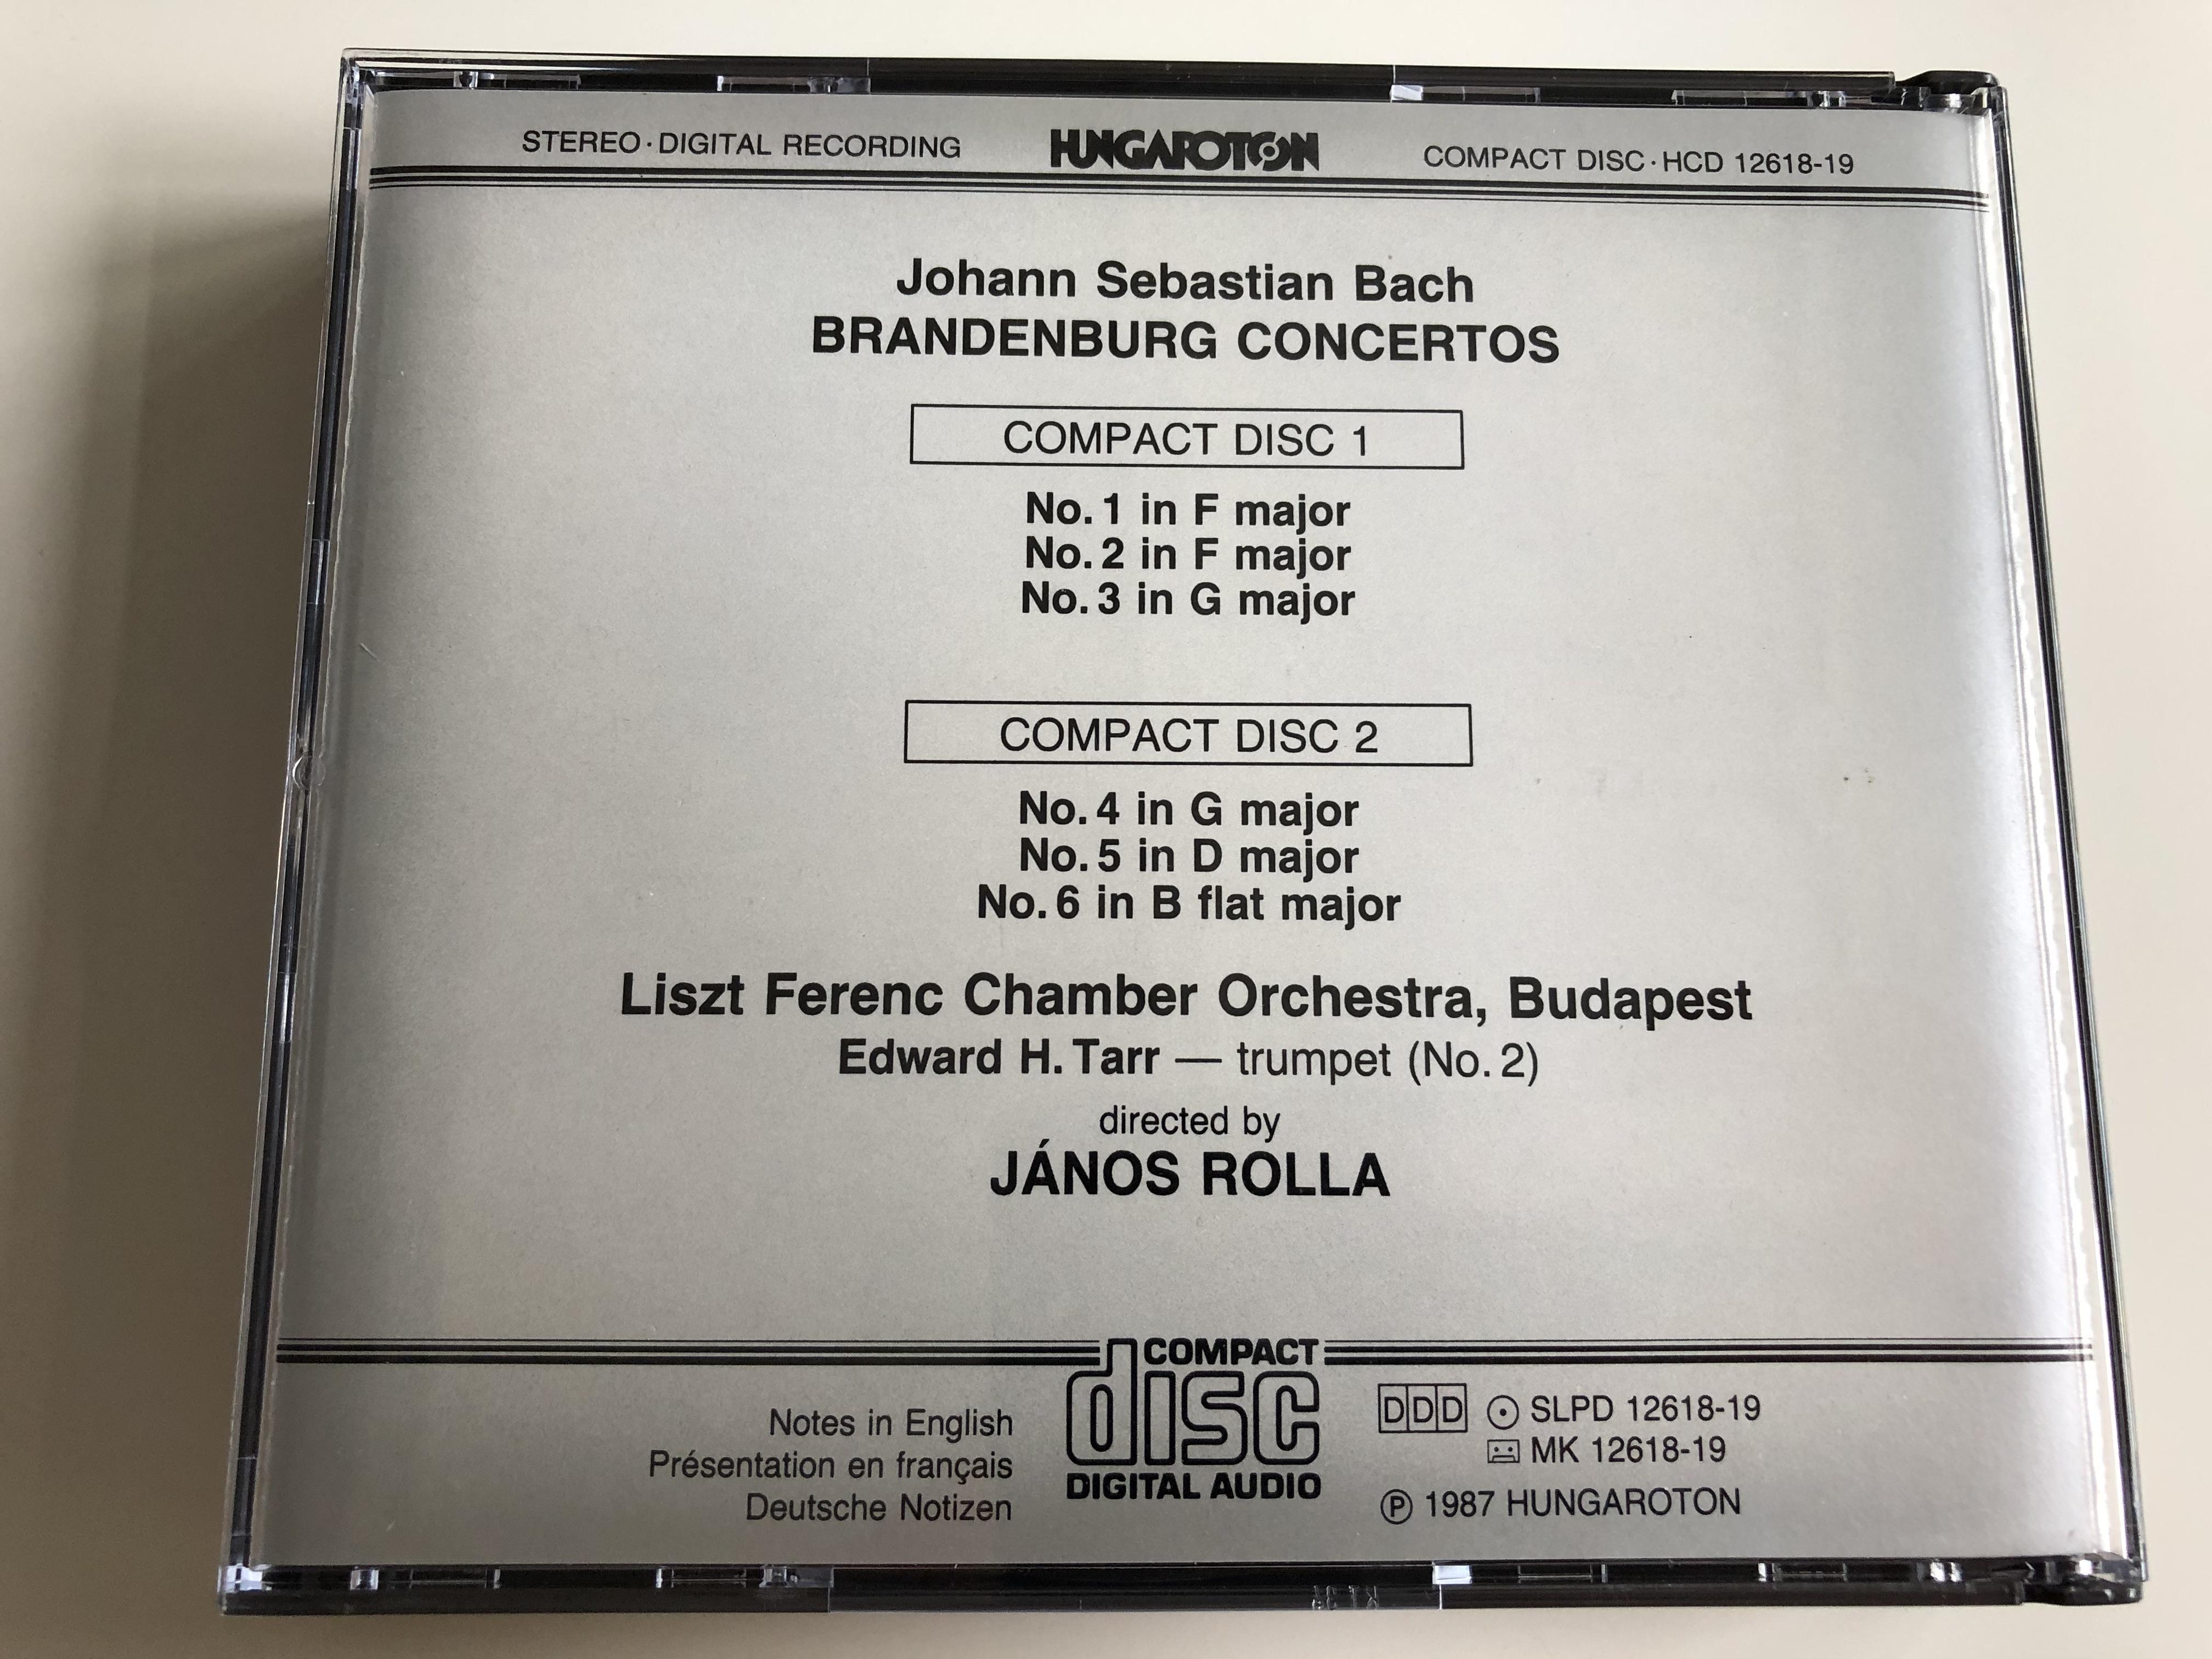 johann-sebastian-bach-brandenburg-concertos-2cd-liszt-ferenc-chamber-orchestra-conducted-by-j-nos-rolla-hungaroton-hcd-12618-19-4-.jpg